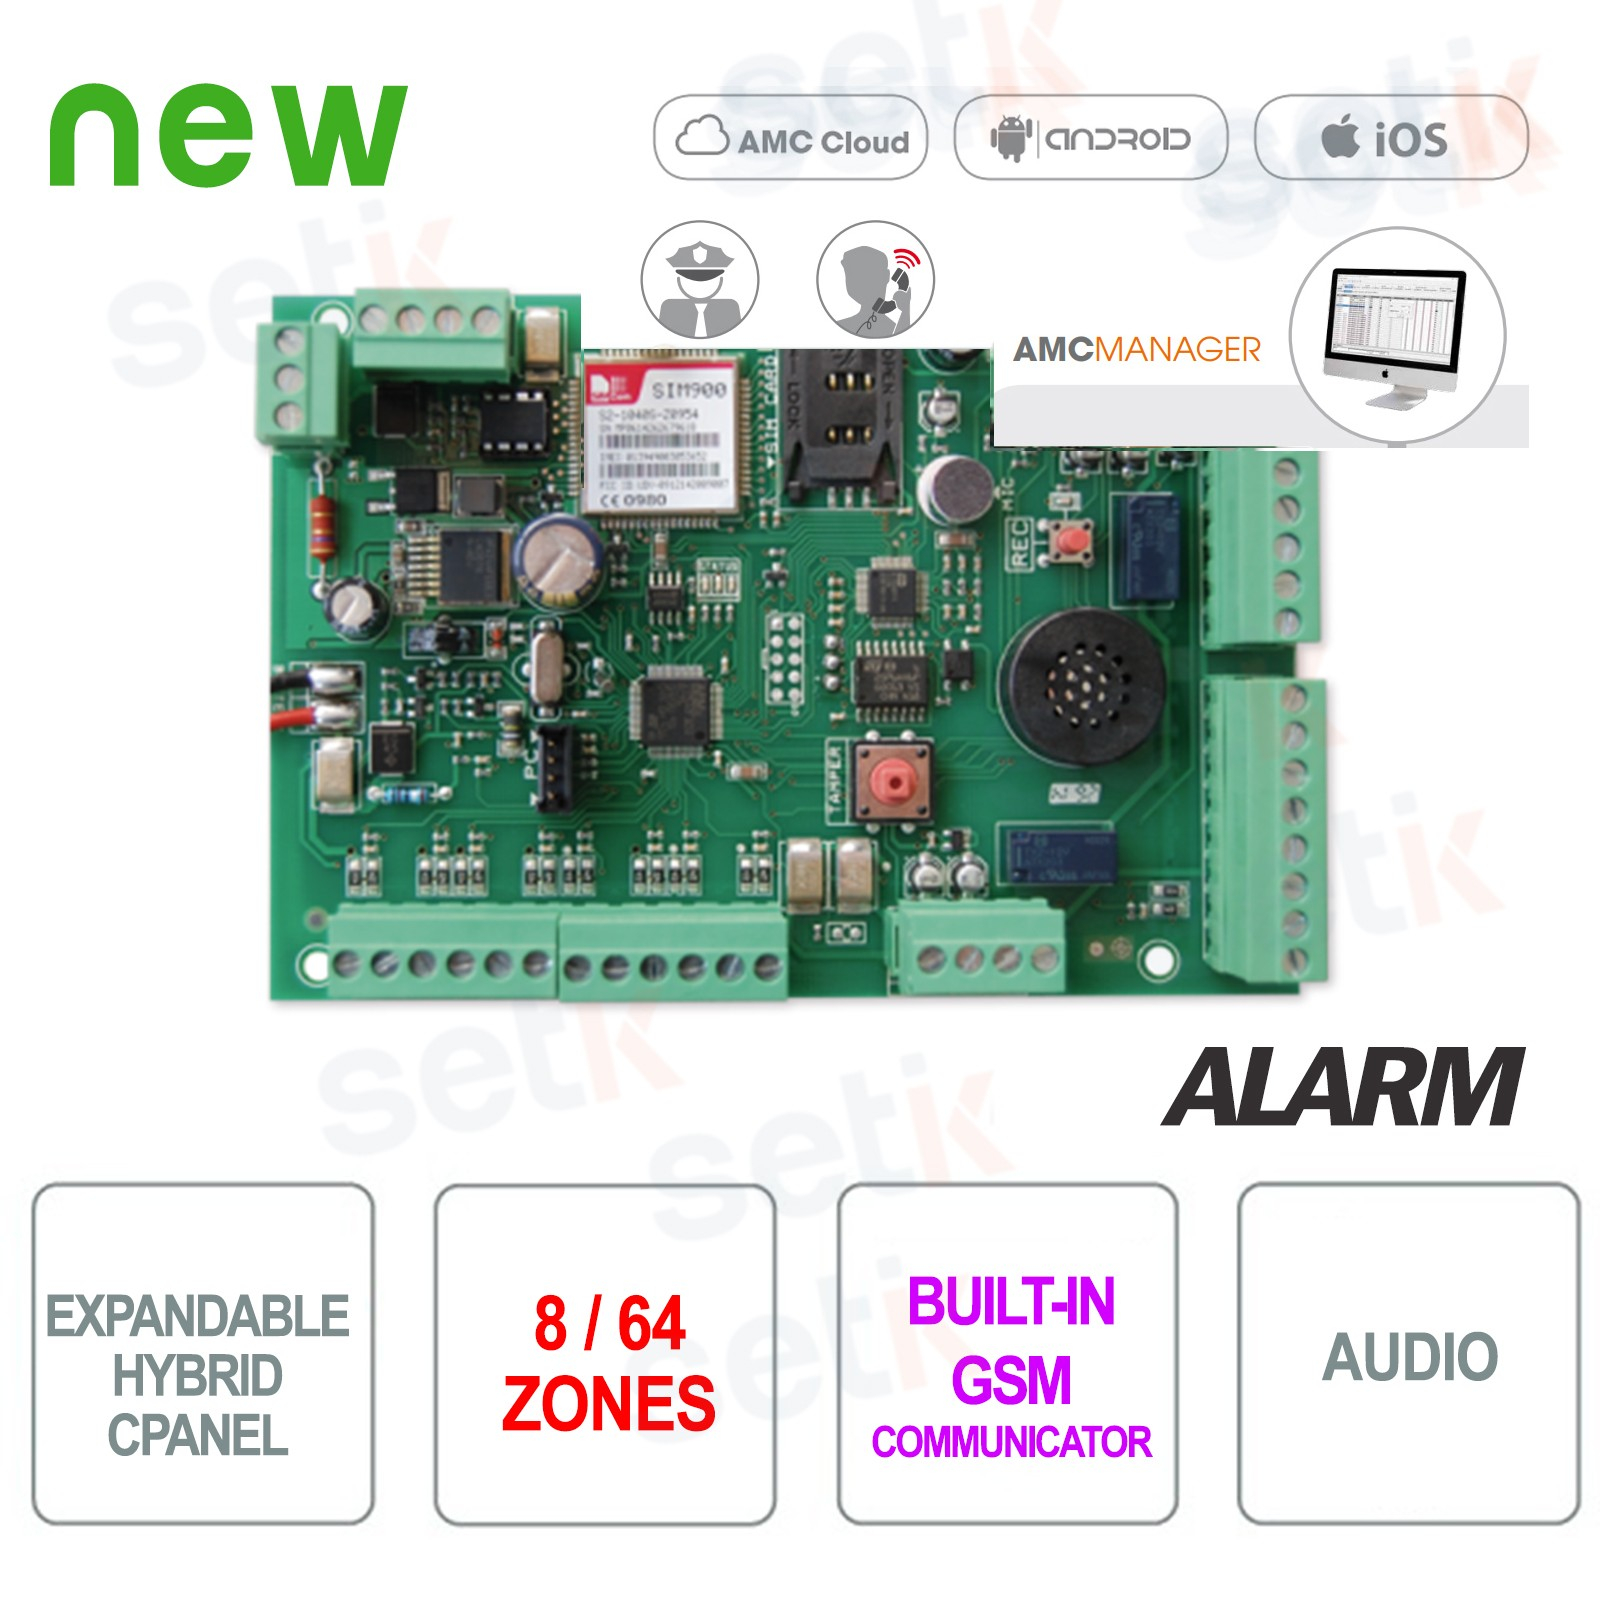 Kit C64 Gsm Kit Allarme 8 zone GSM AMC